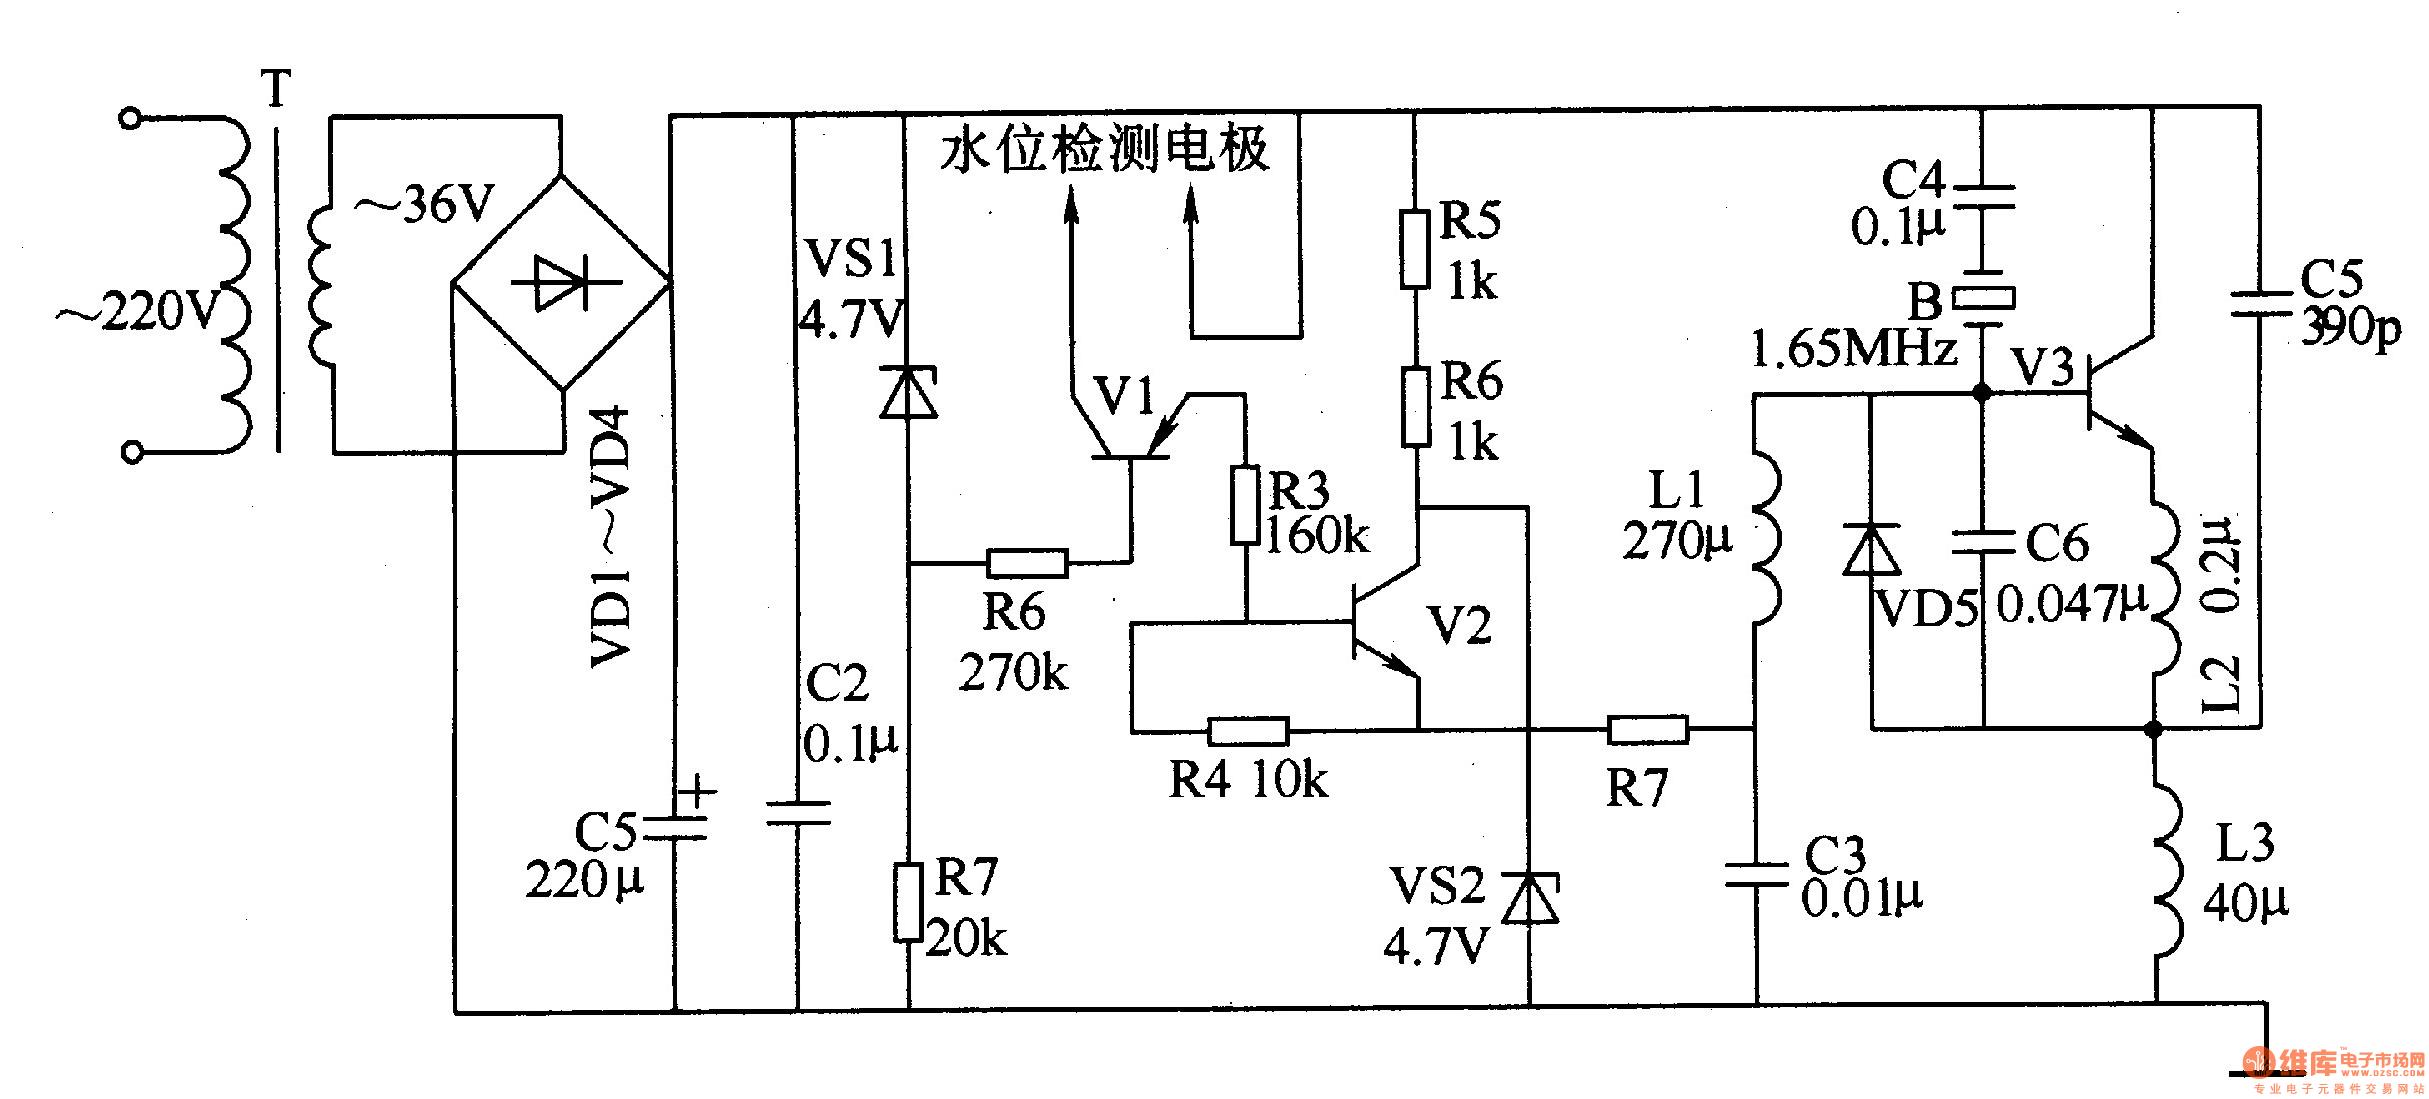 Gt Circuits Gt Ultrasonic Atomizer 1 L